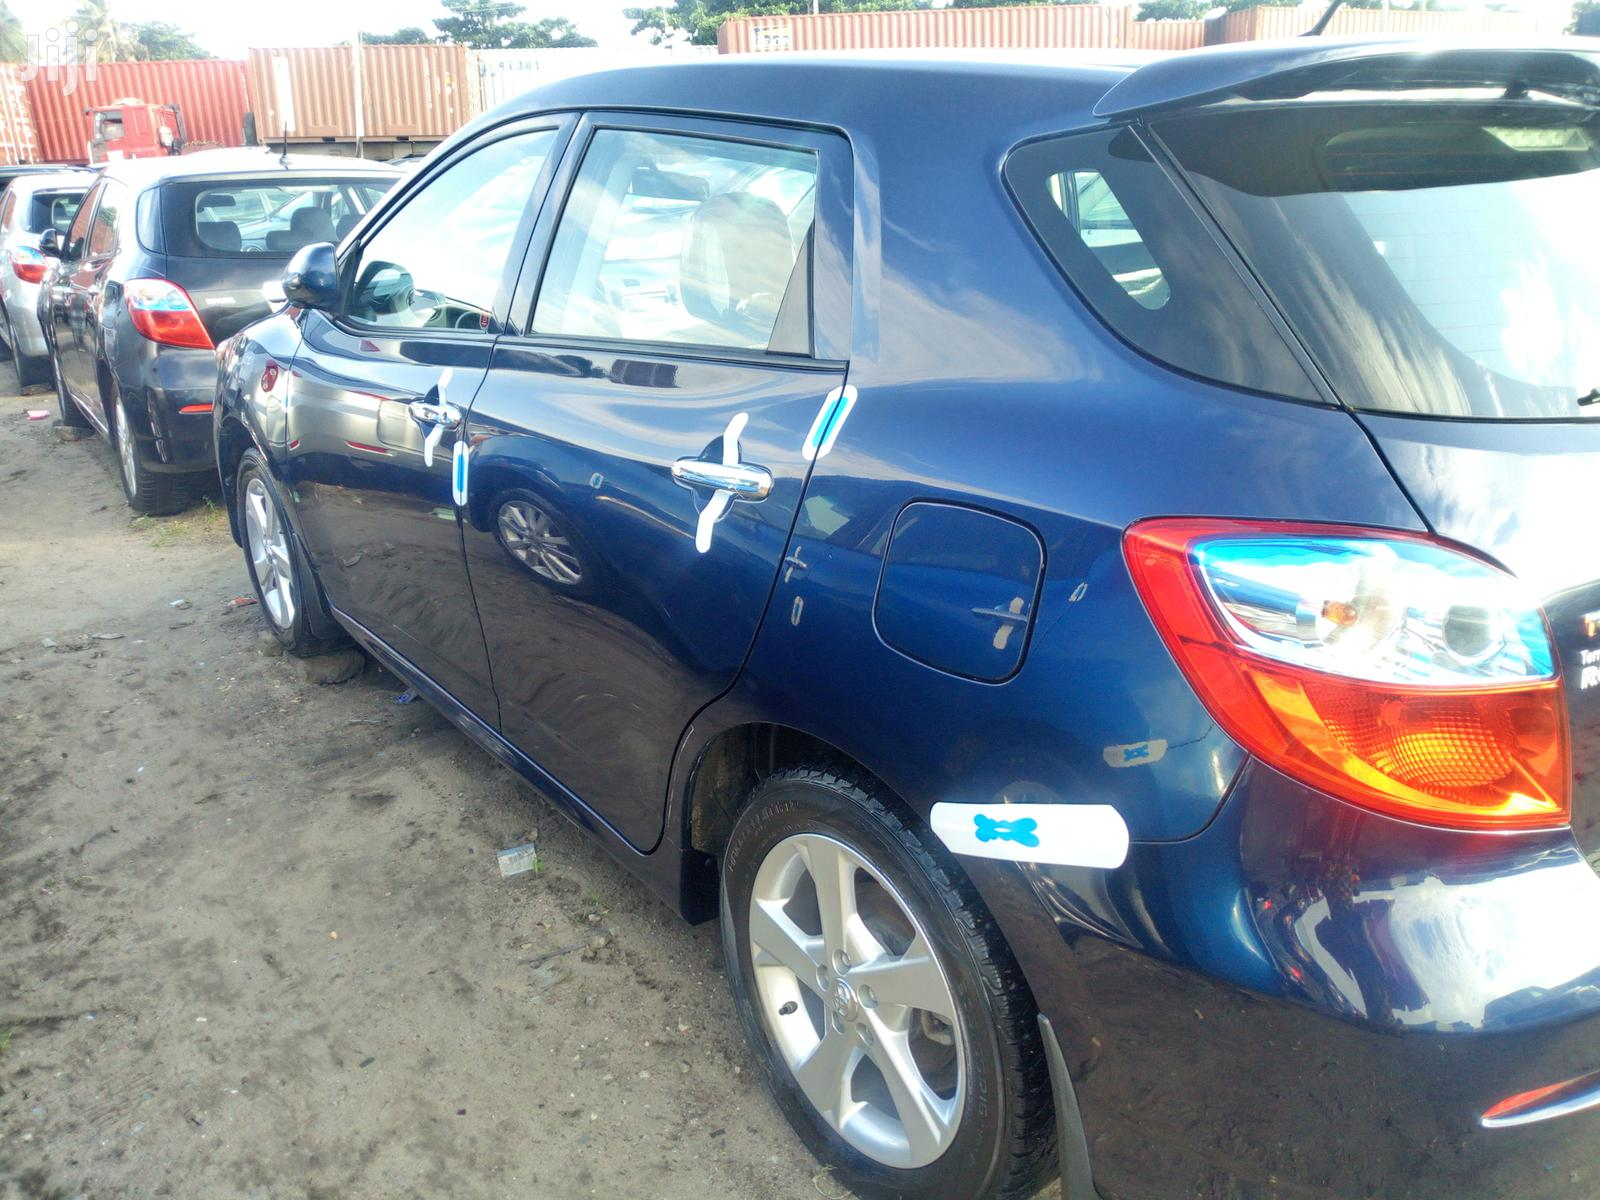 Archive Toyota Matrix 2010 Blue In Lagos State Cars Leonardo Auto Concerns Jiji Ng